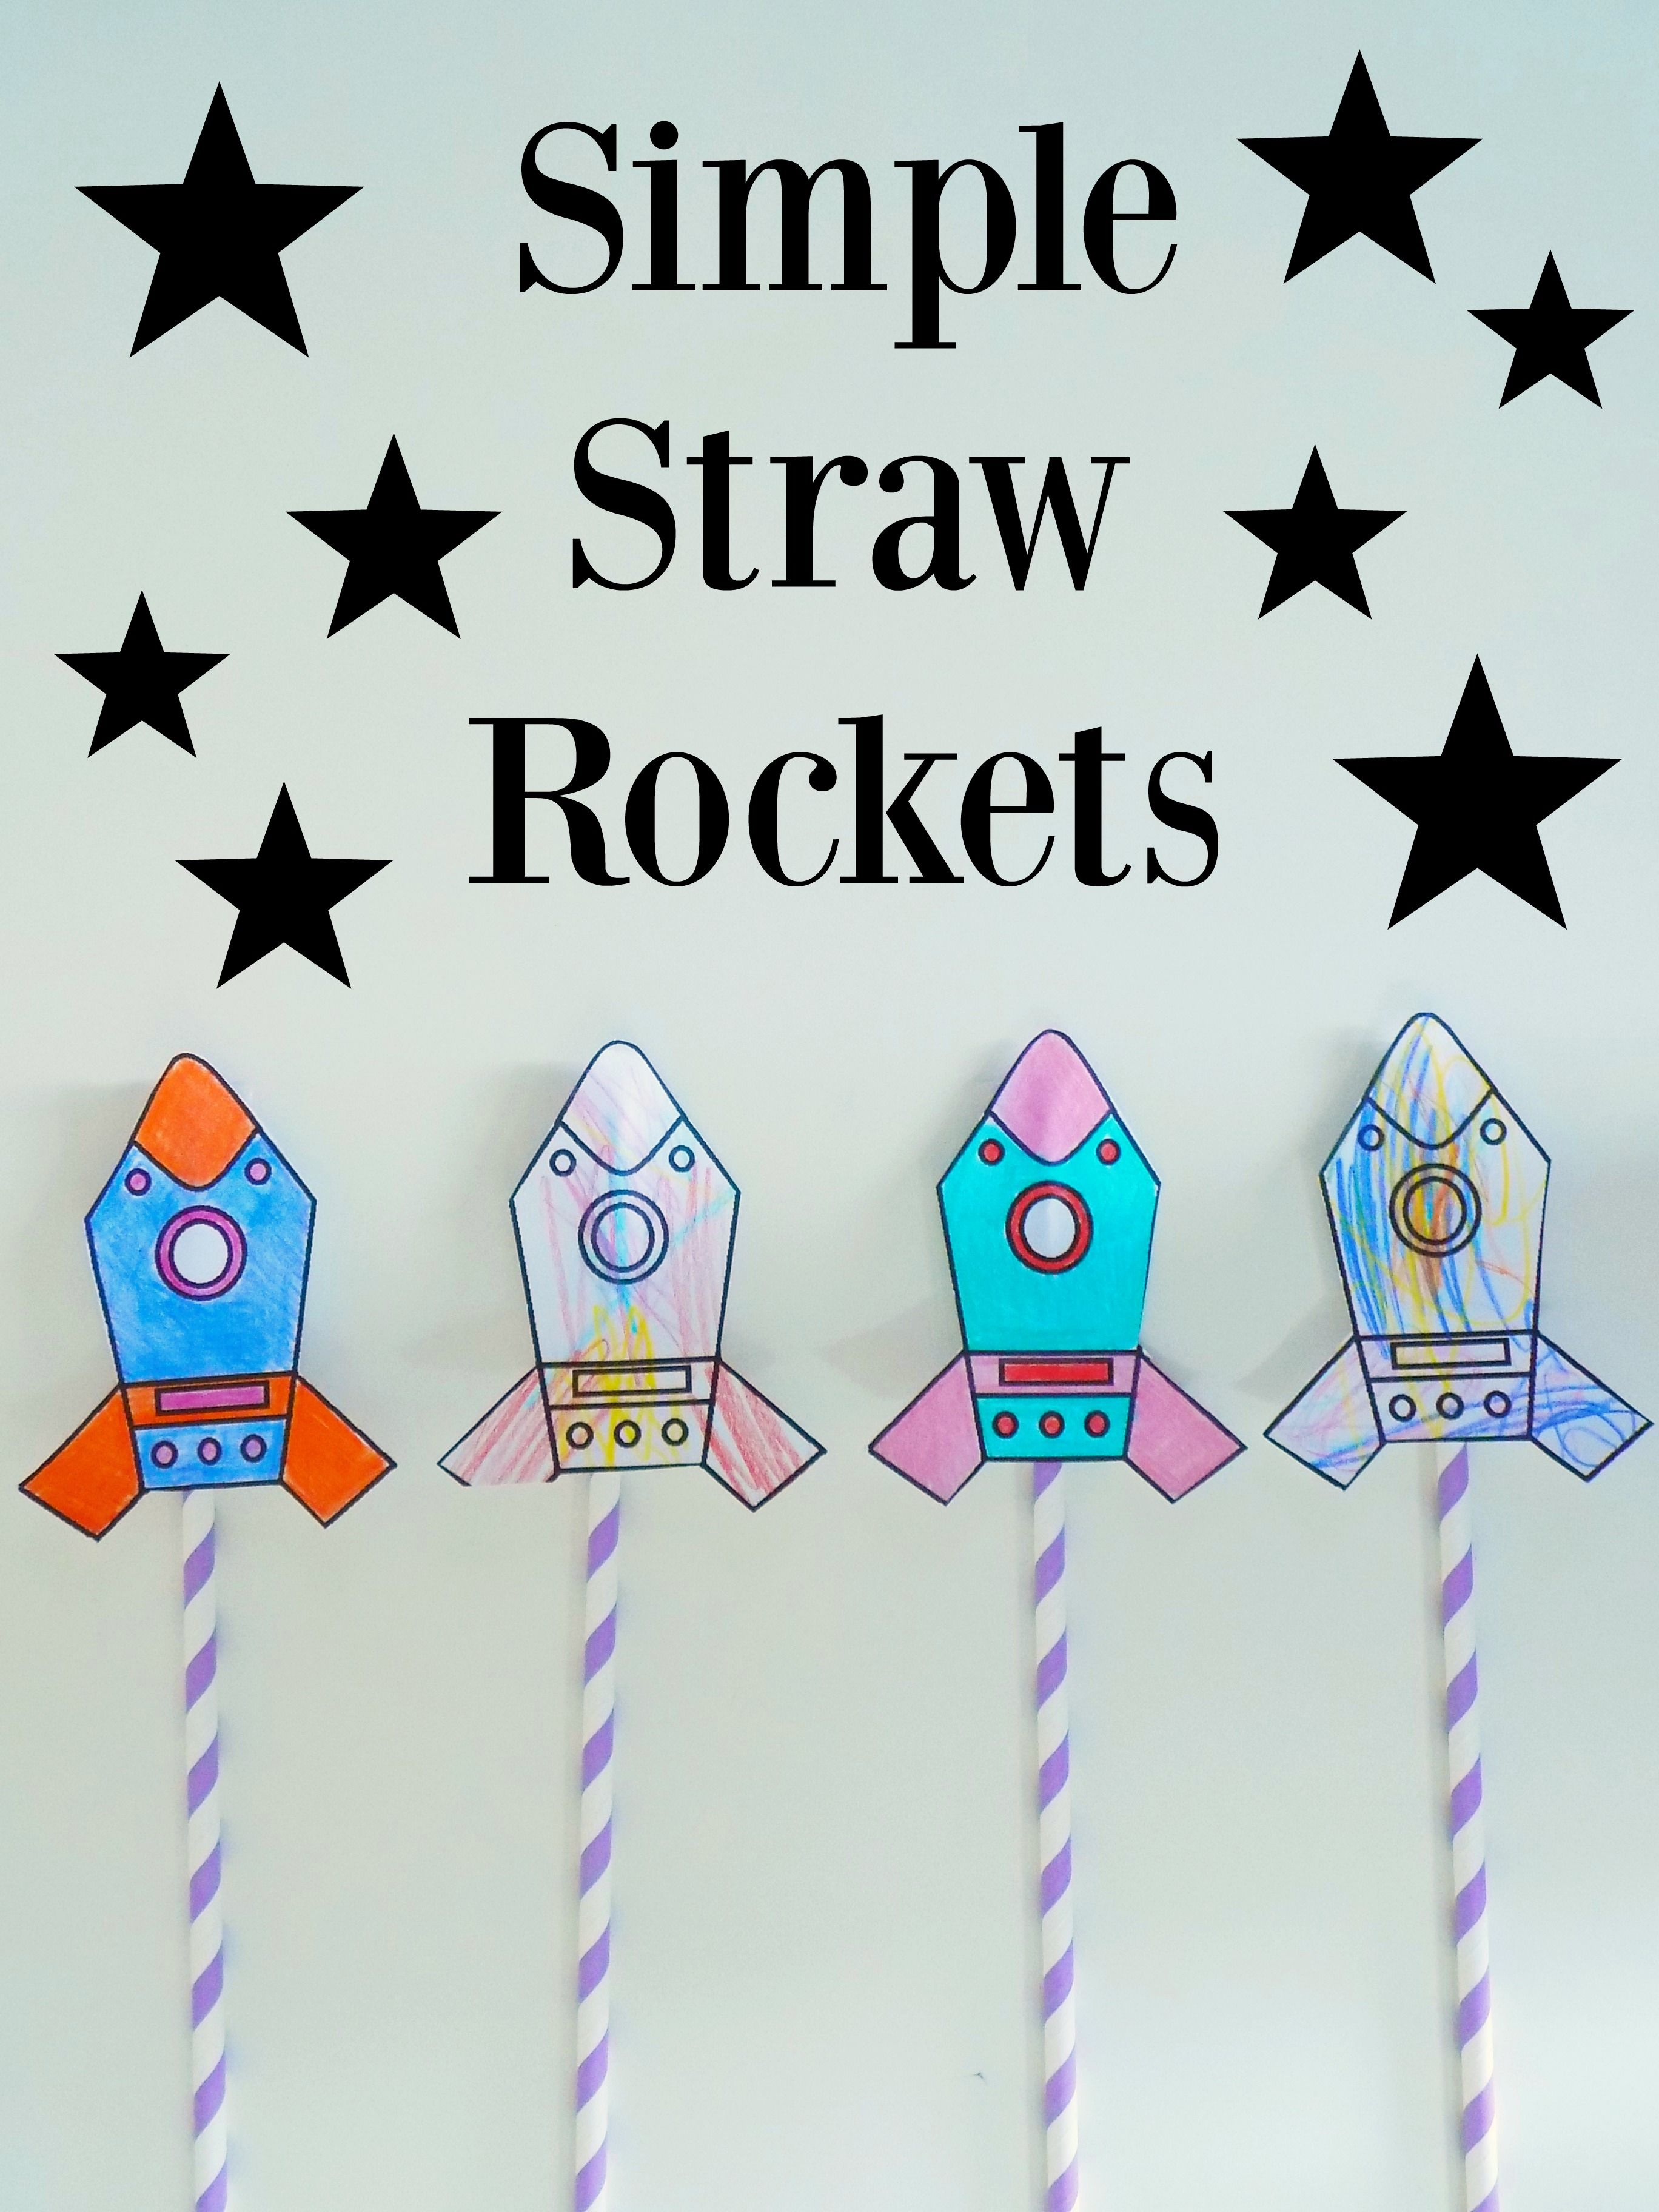 Simple Straw Rockets + Free Printable!   Preschool Education - Free Printable Crafts For Preschoolers